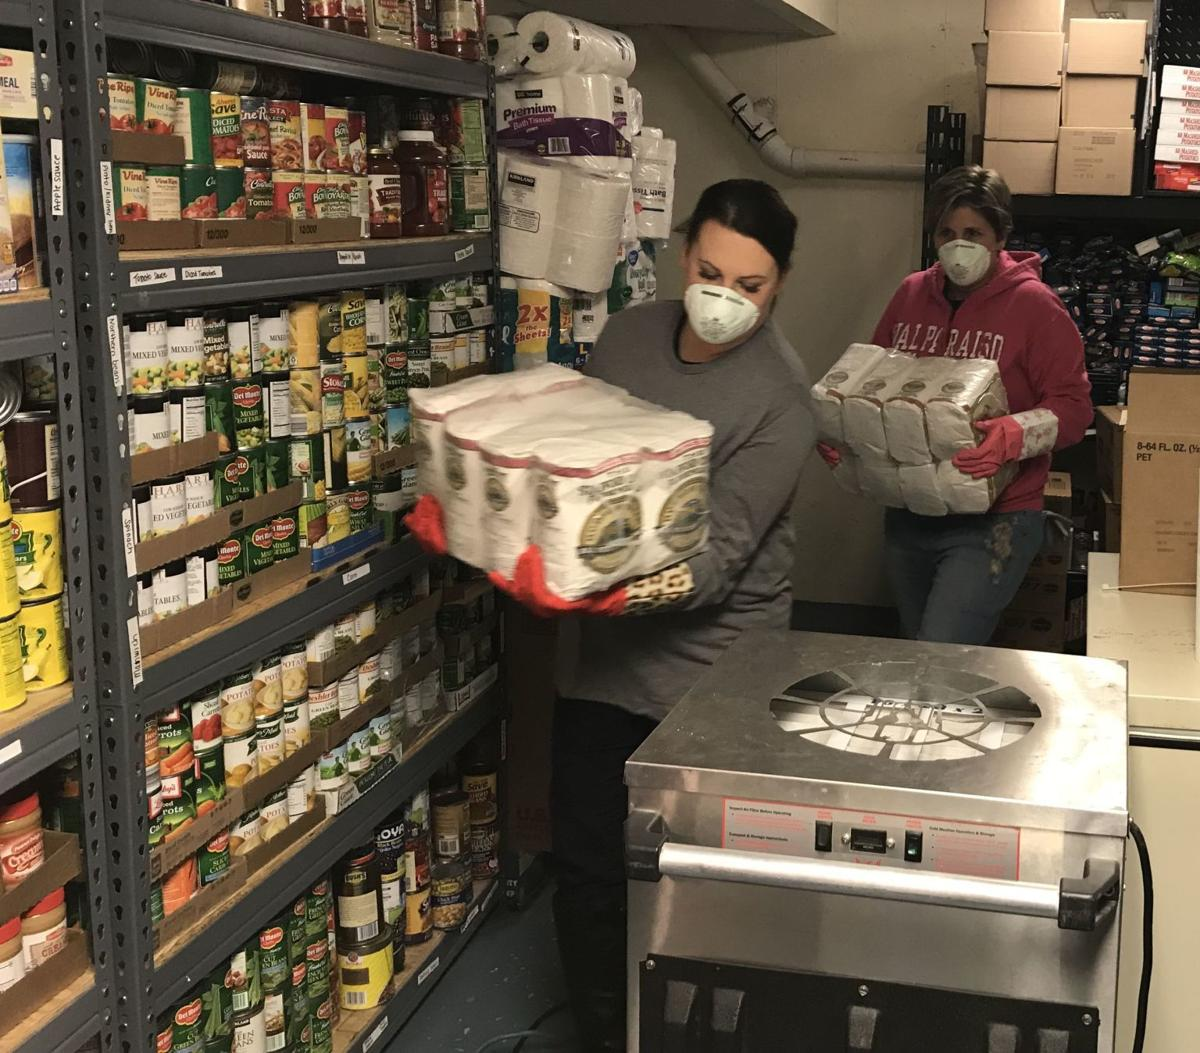 Hilltop Food Pantry flooding